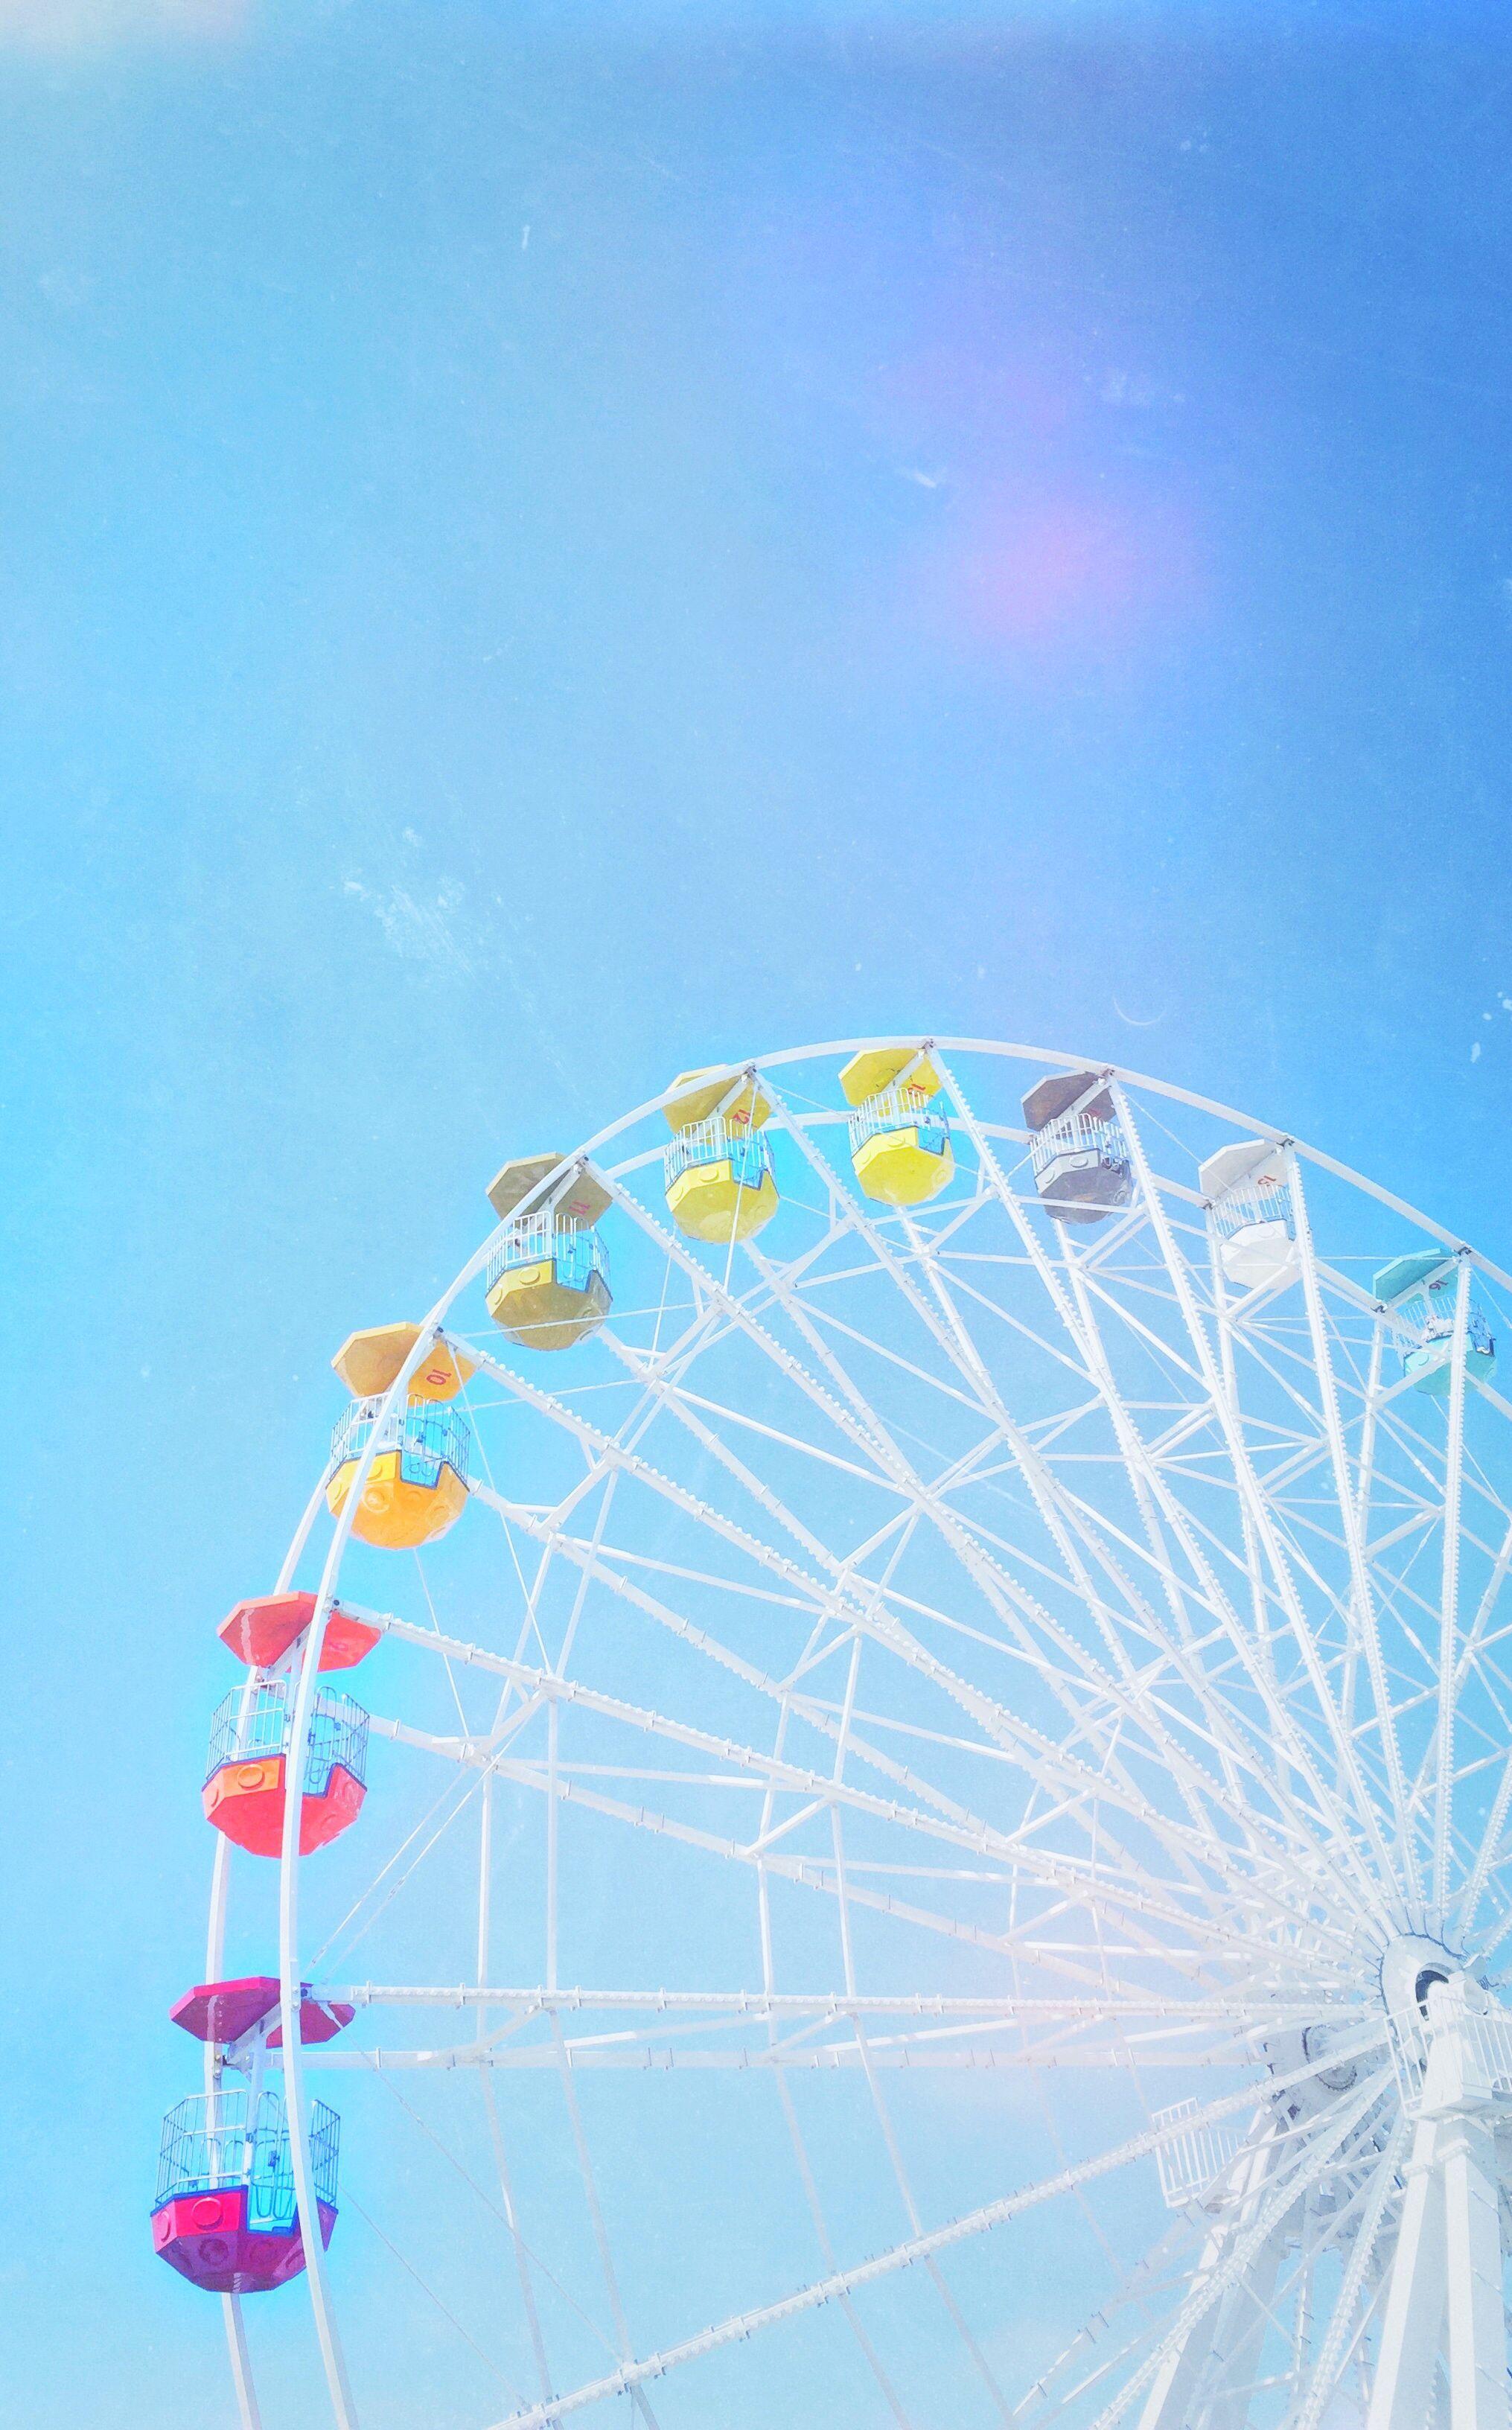 Everyday rainbow, summer photos. Ferris wheel of dreams